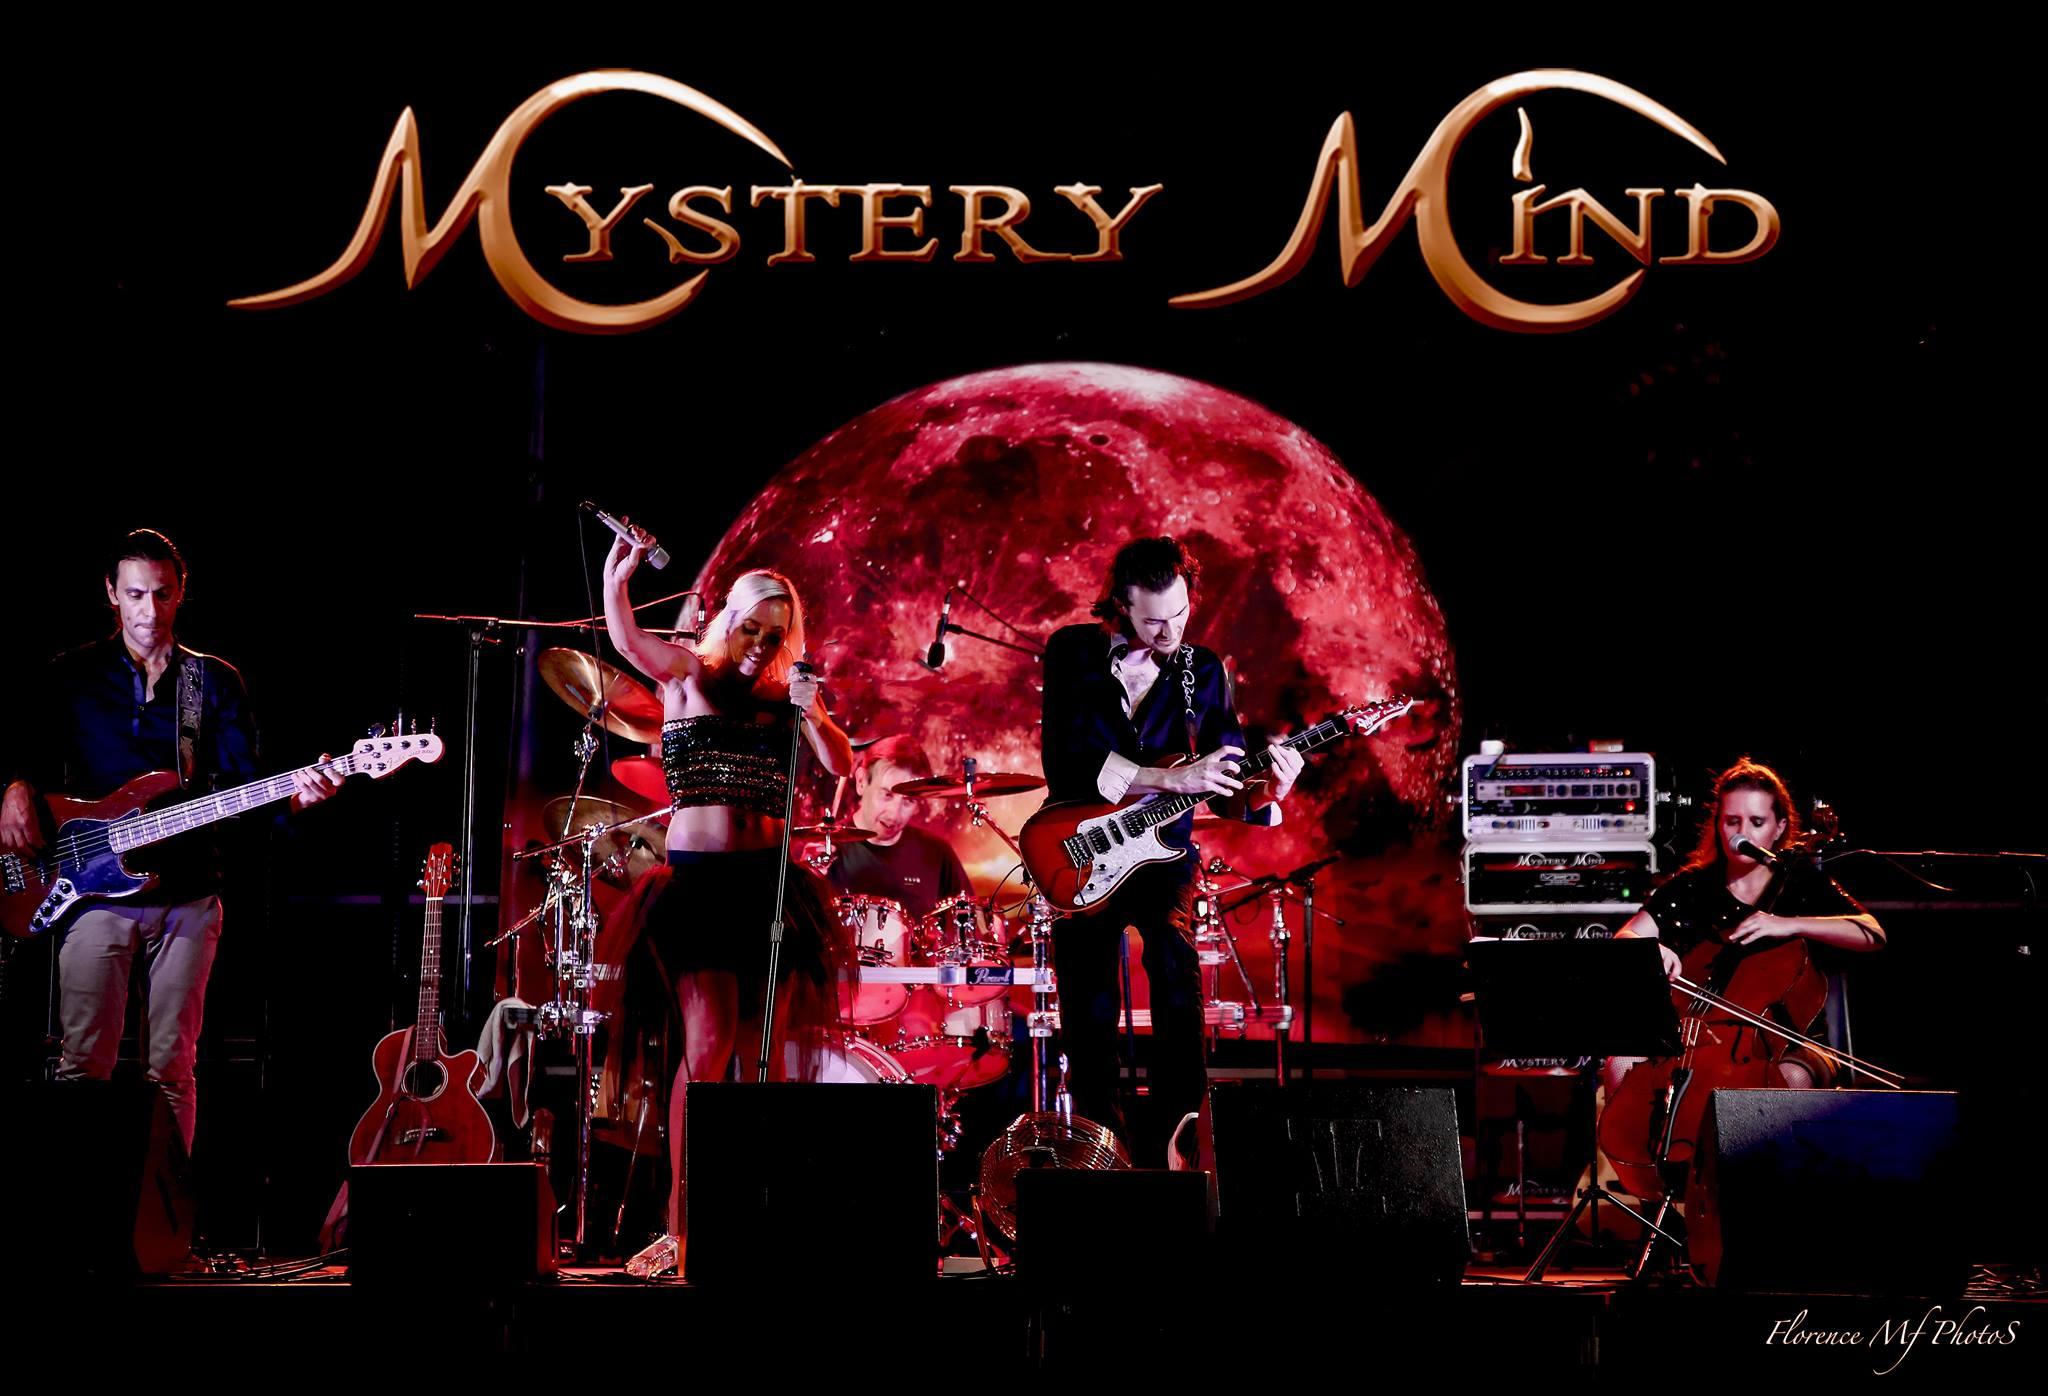 mystery mind - rock progressif mélodique français